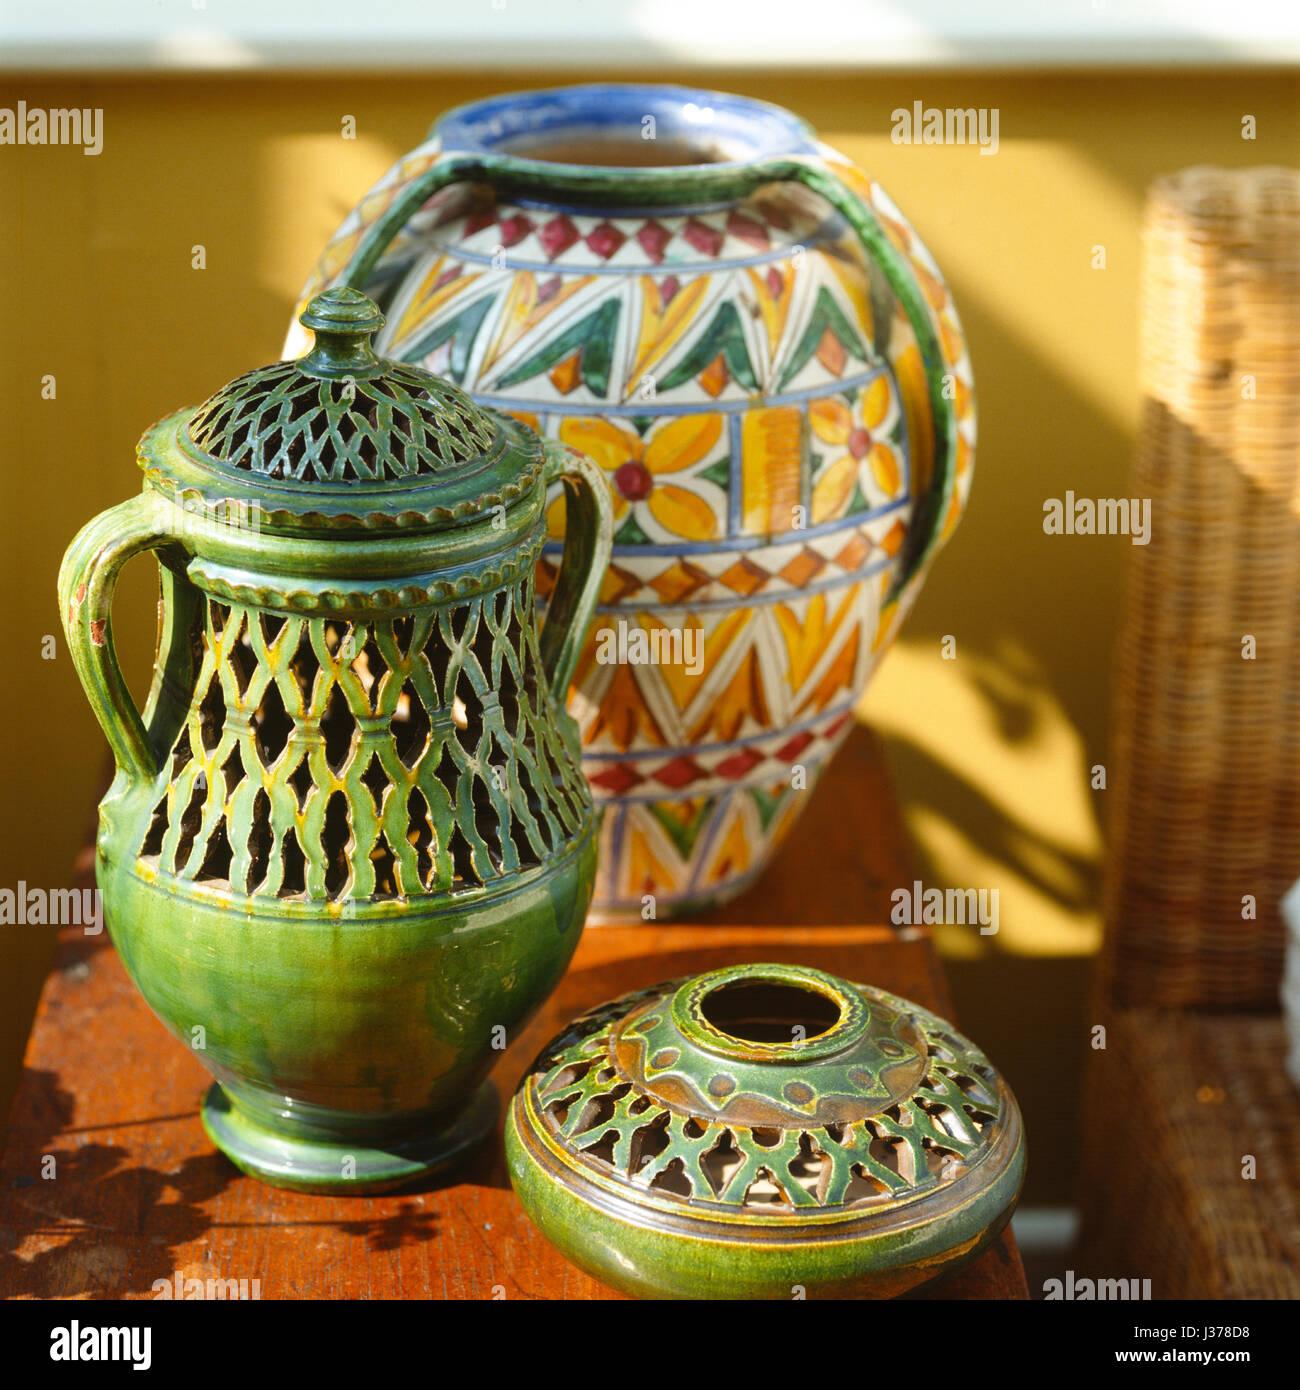 Three patterned vases. Stock Photo